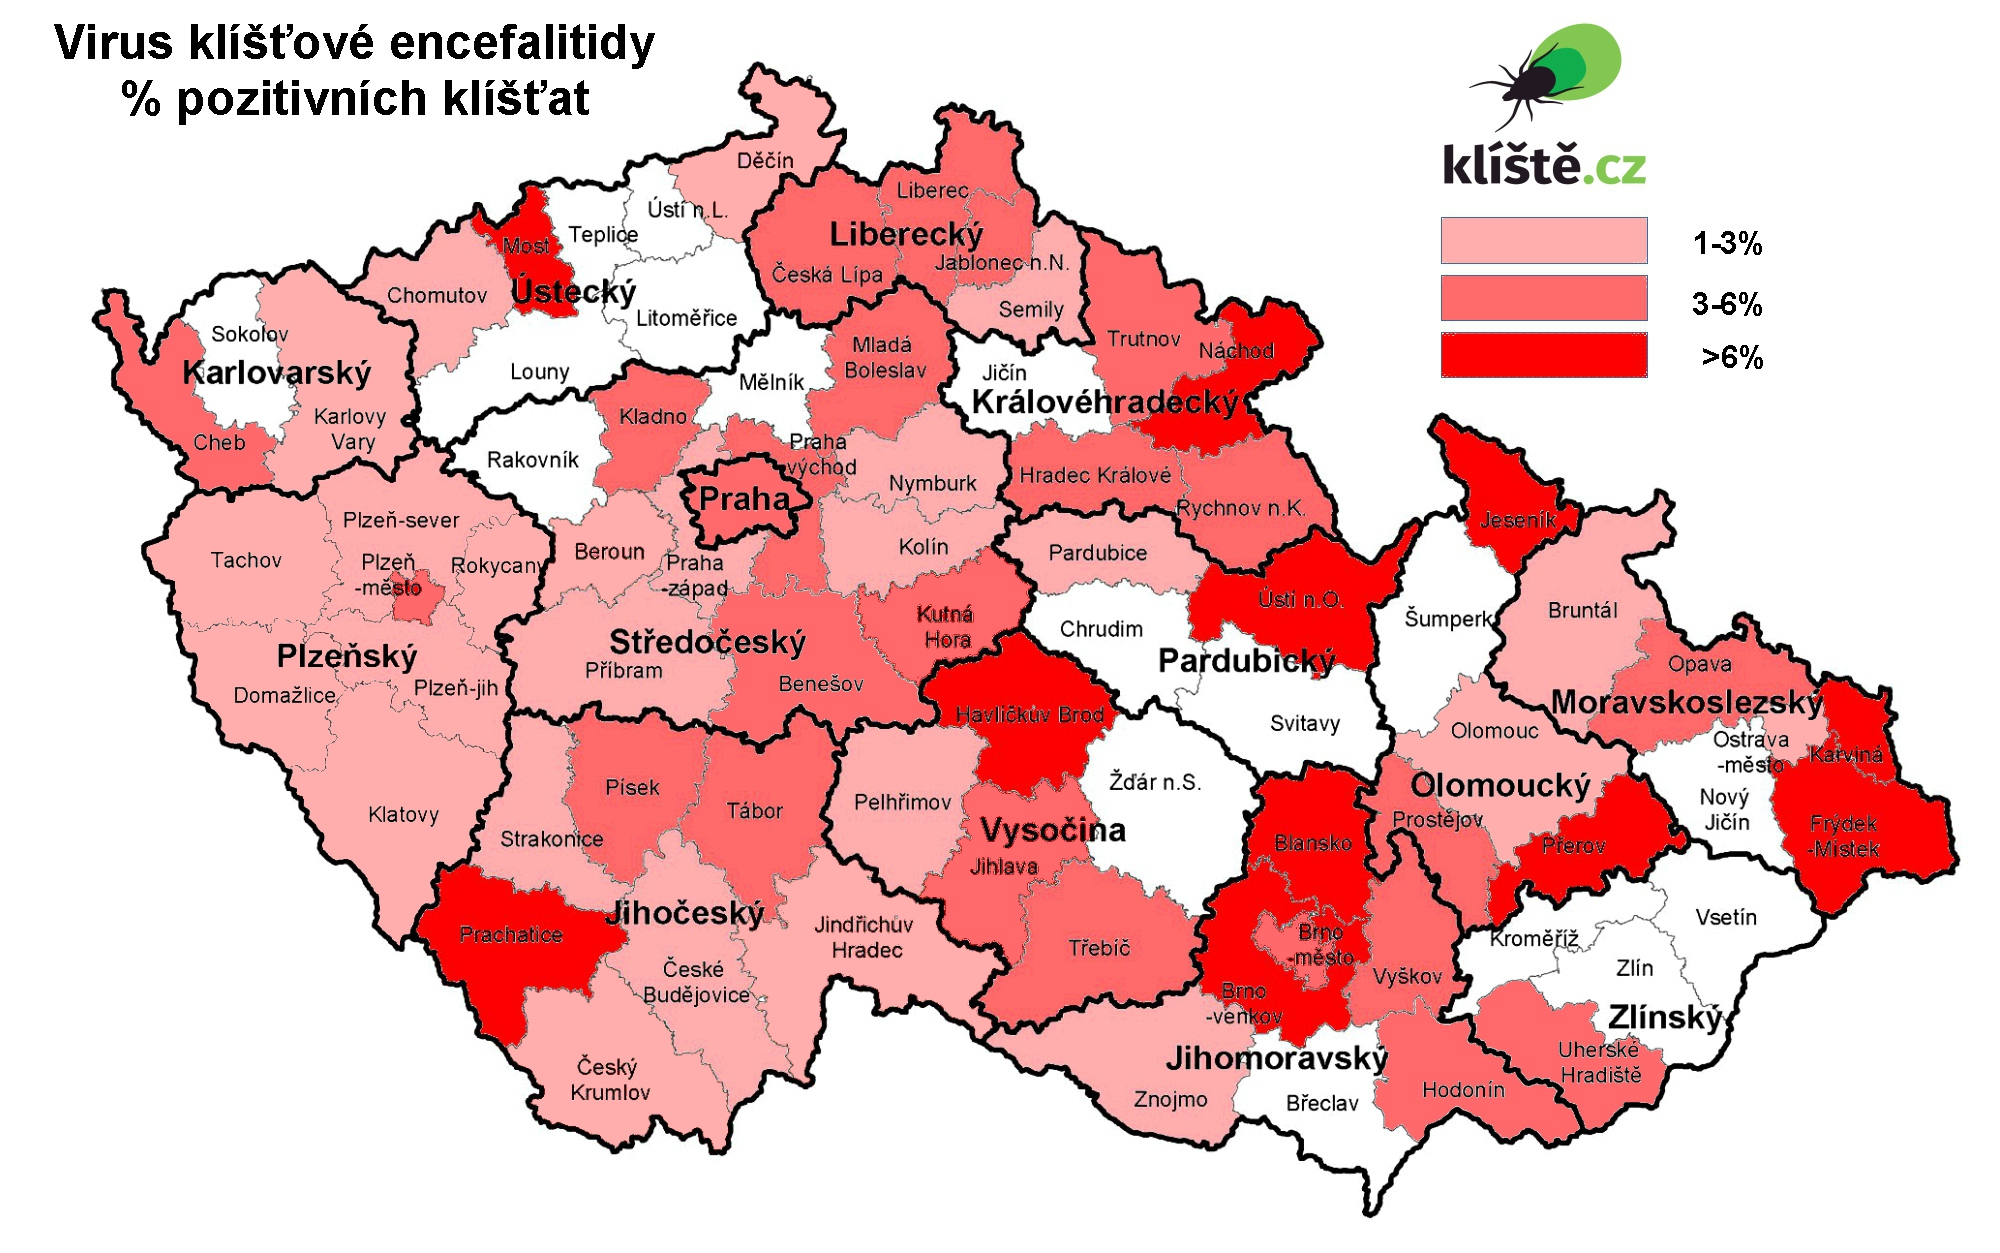 mapa výskytu